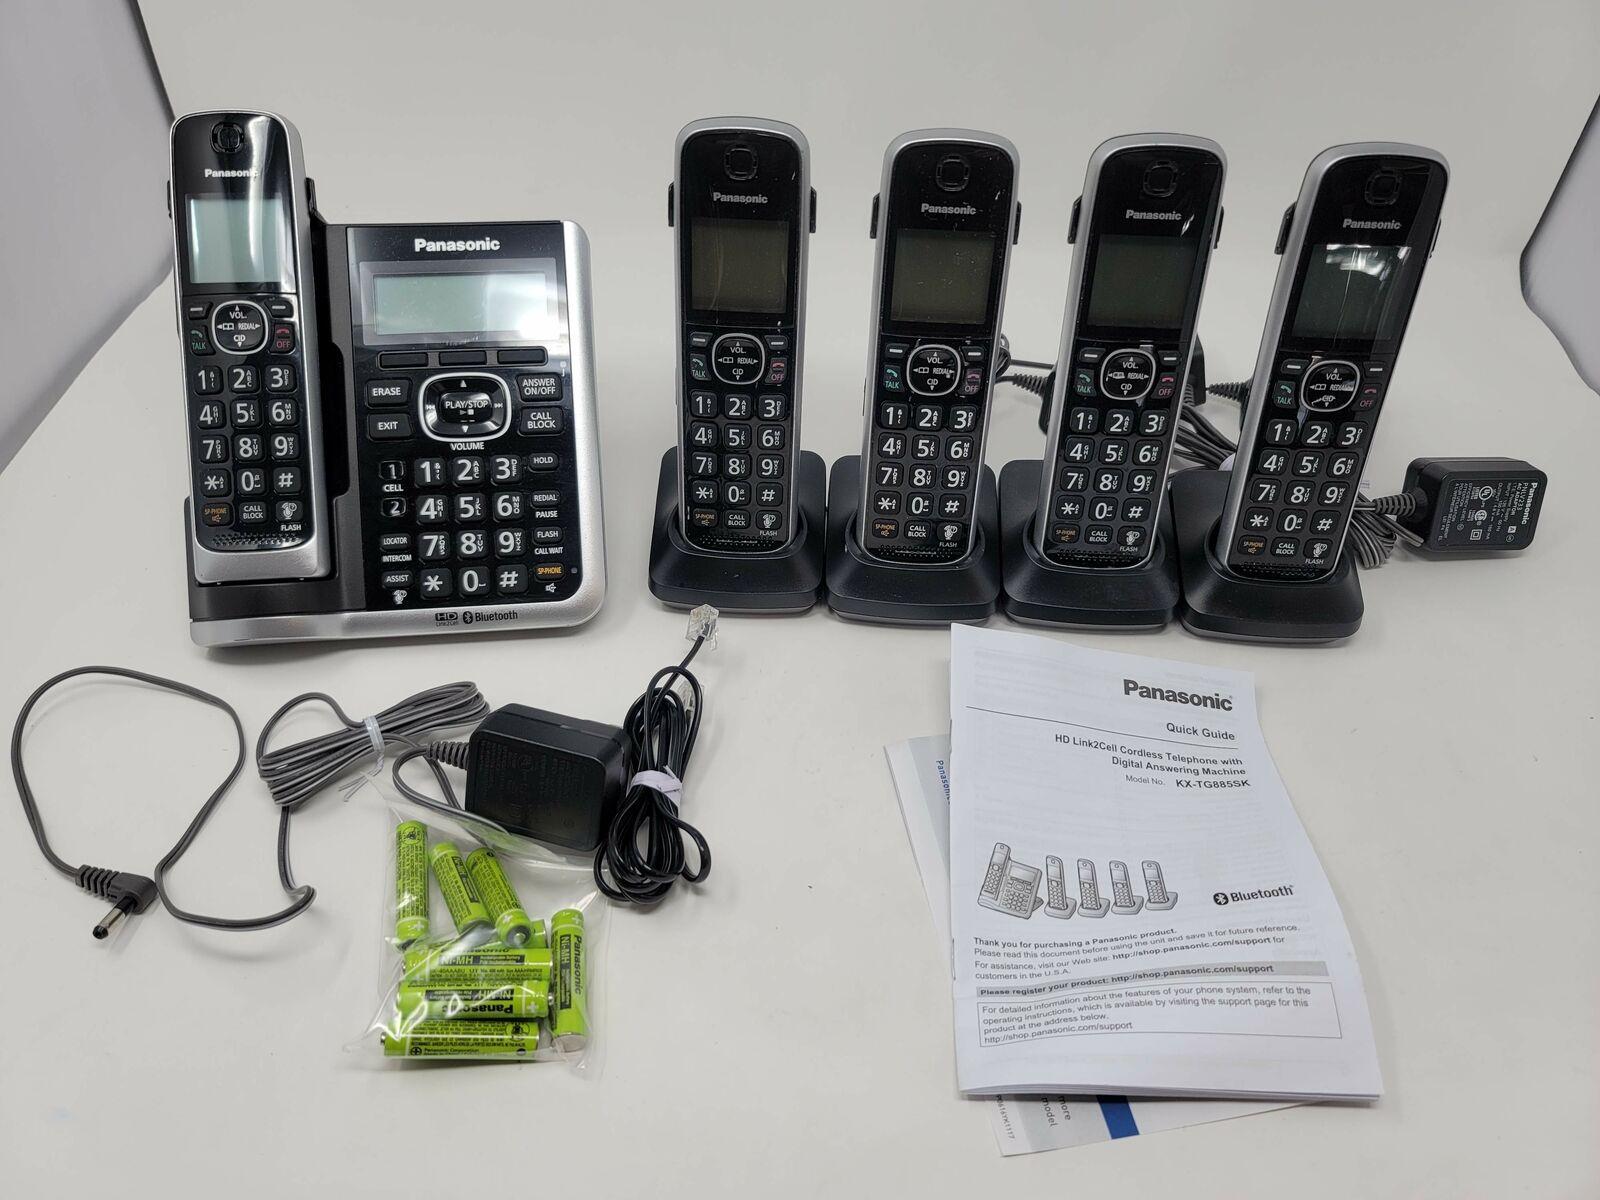 Panasonic KX-TG885SK 5 Handset Cordless Phone DECT 6.0 Technology